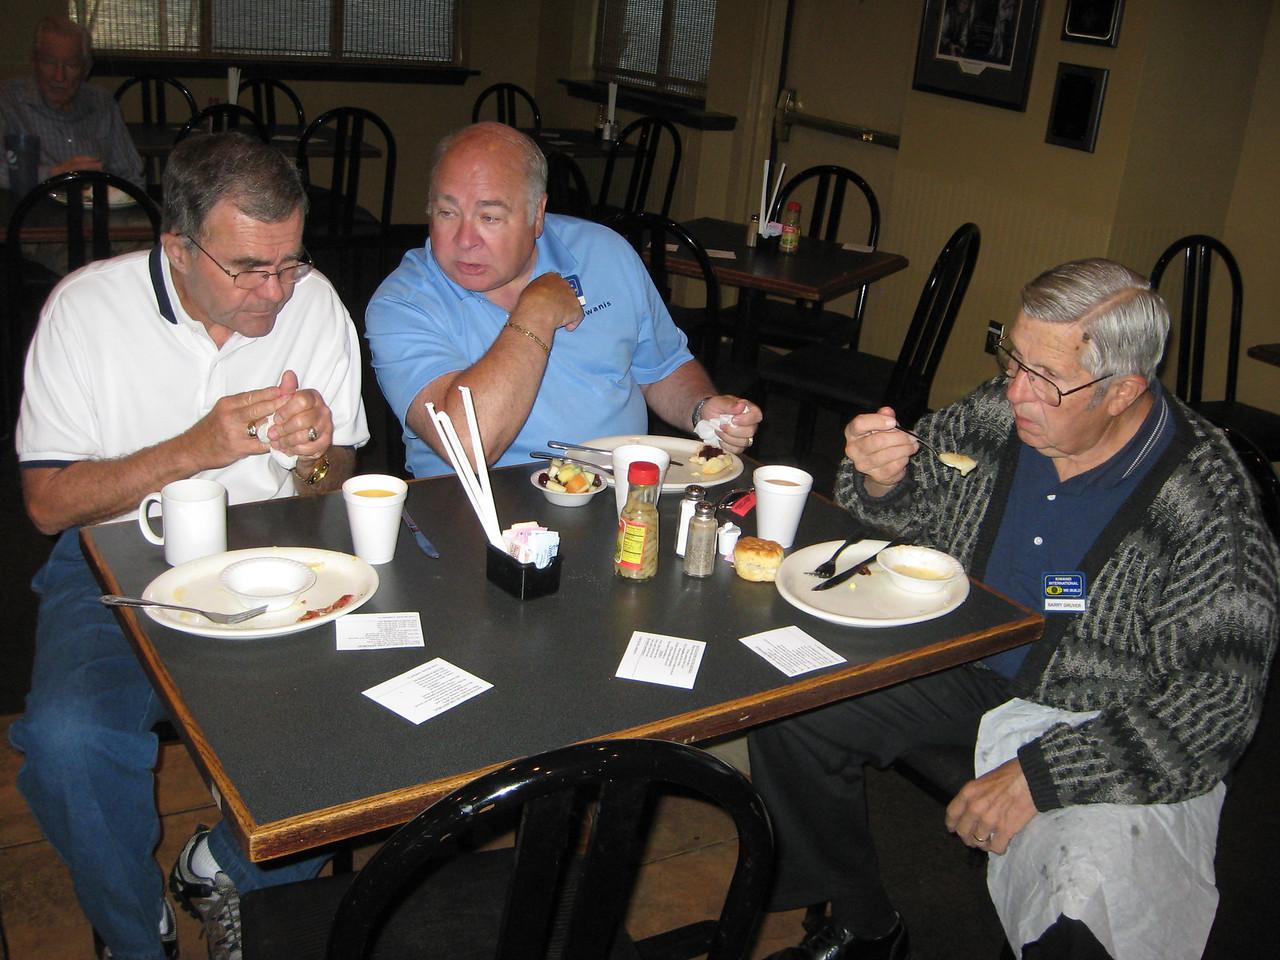 Randy Johnson, Bruce Buehler, Barry Gruver